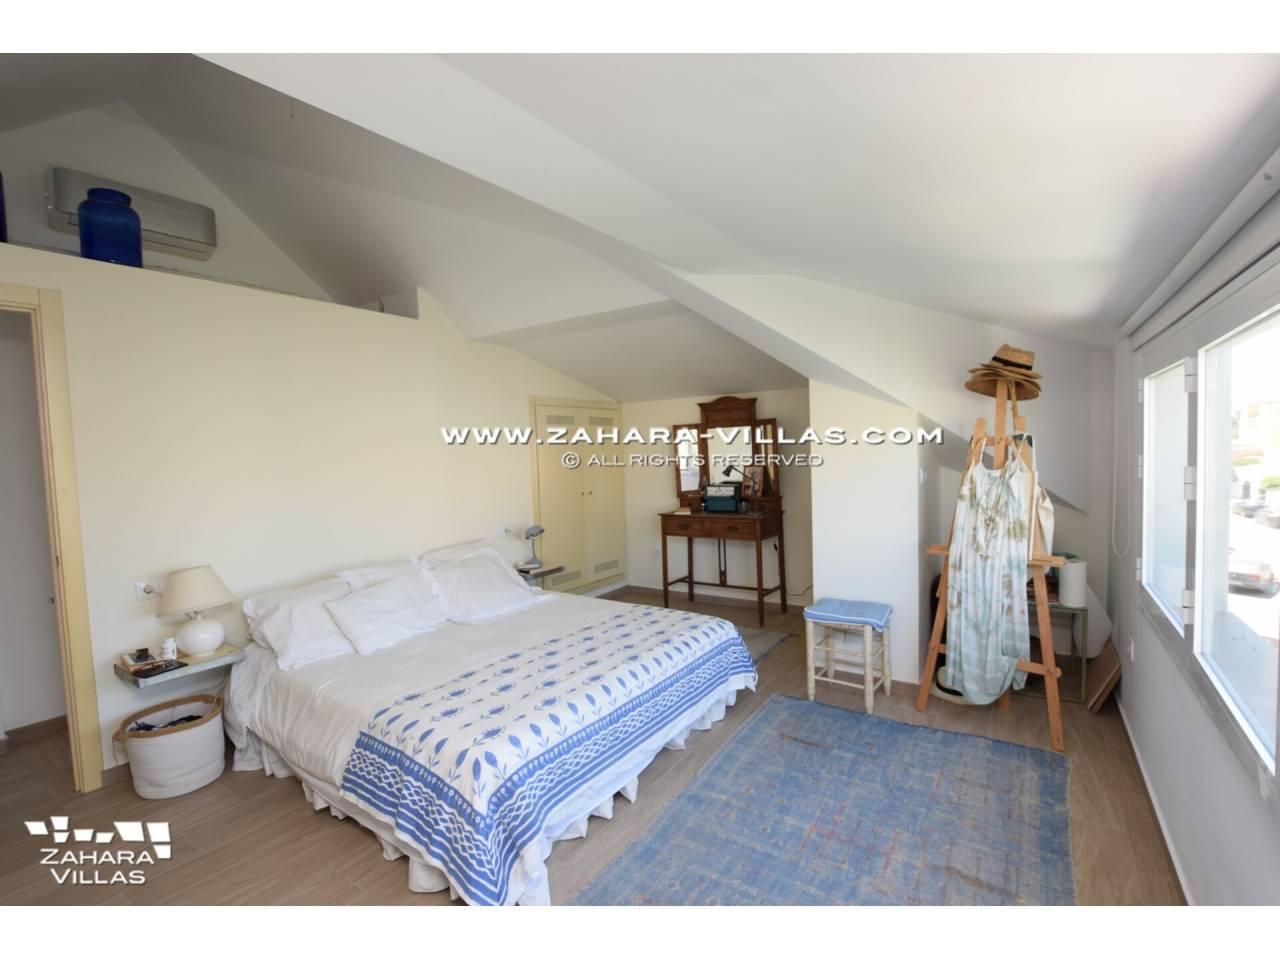 Imagen 39 de House for sale close to the beach, with sea views in Zahara de los Atunes